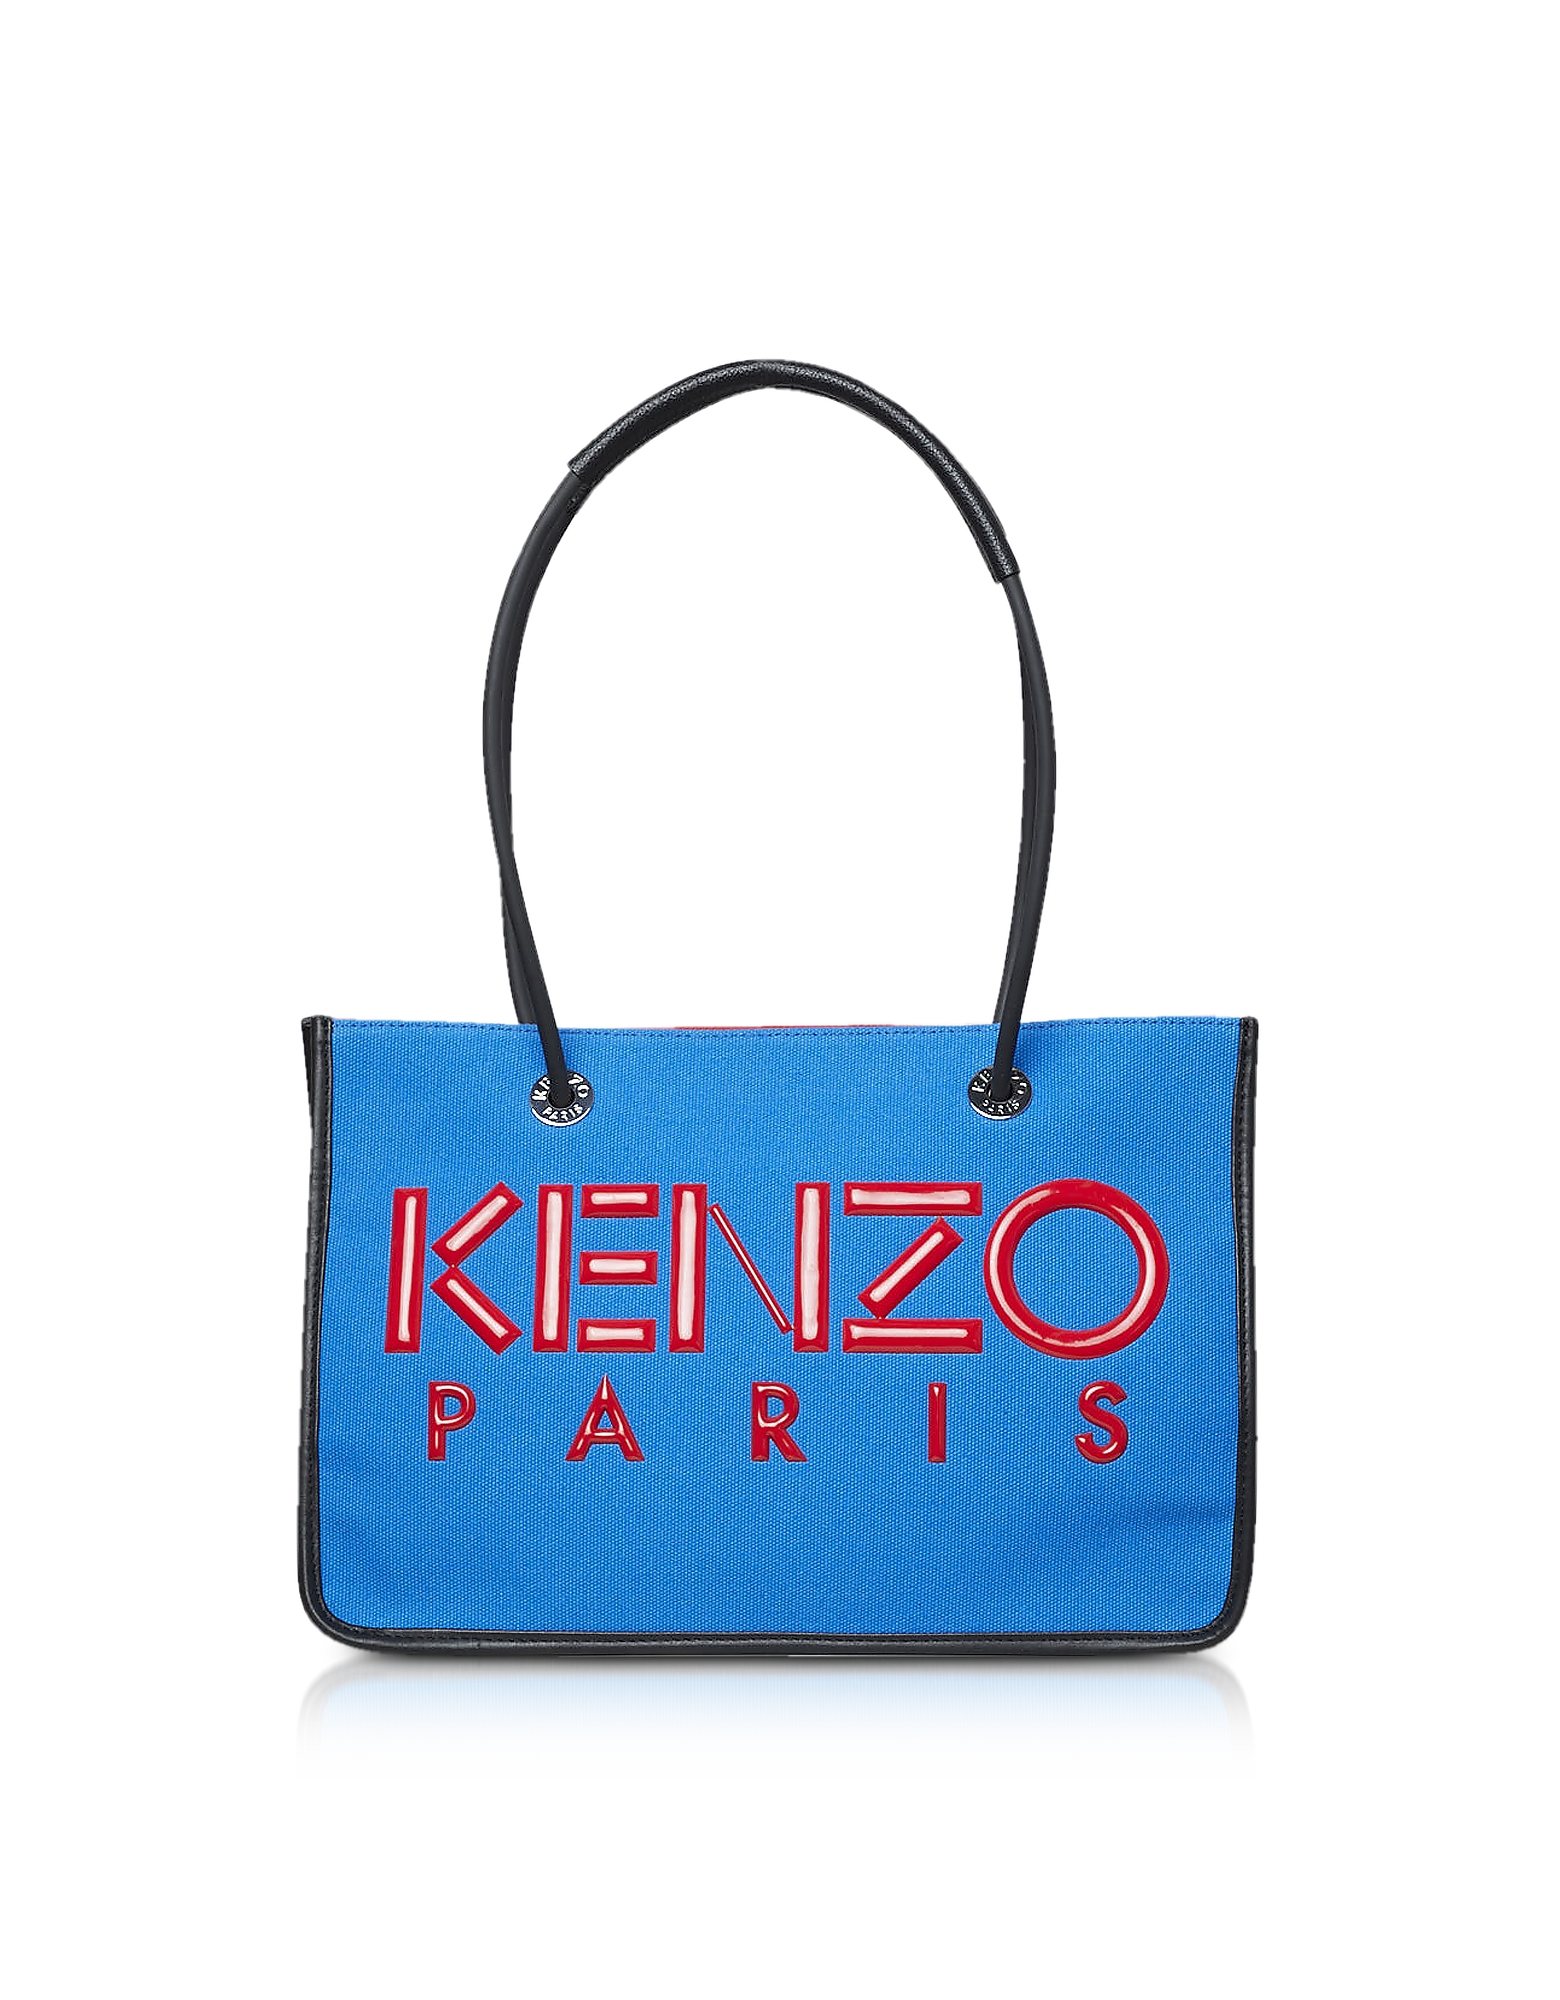 Kenzo Handbags, Kenzo Kombo Tote Bag